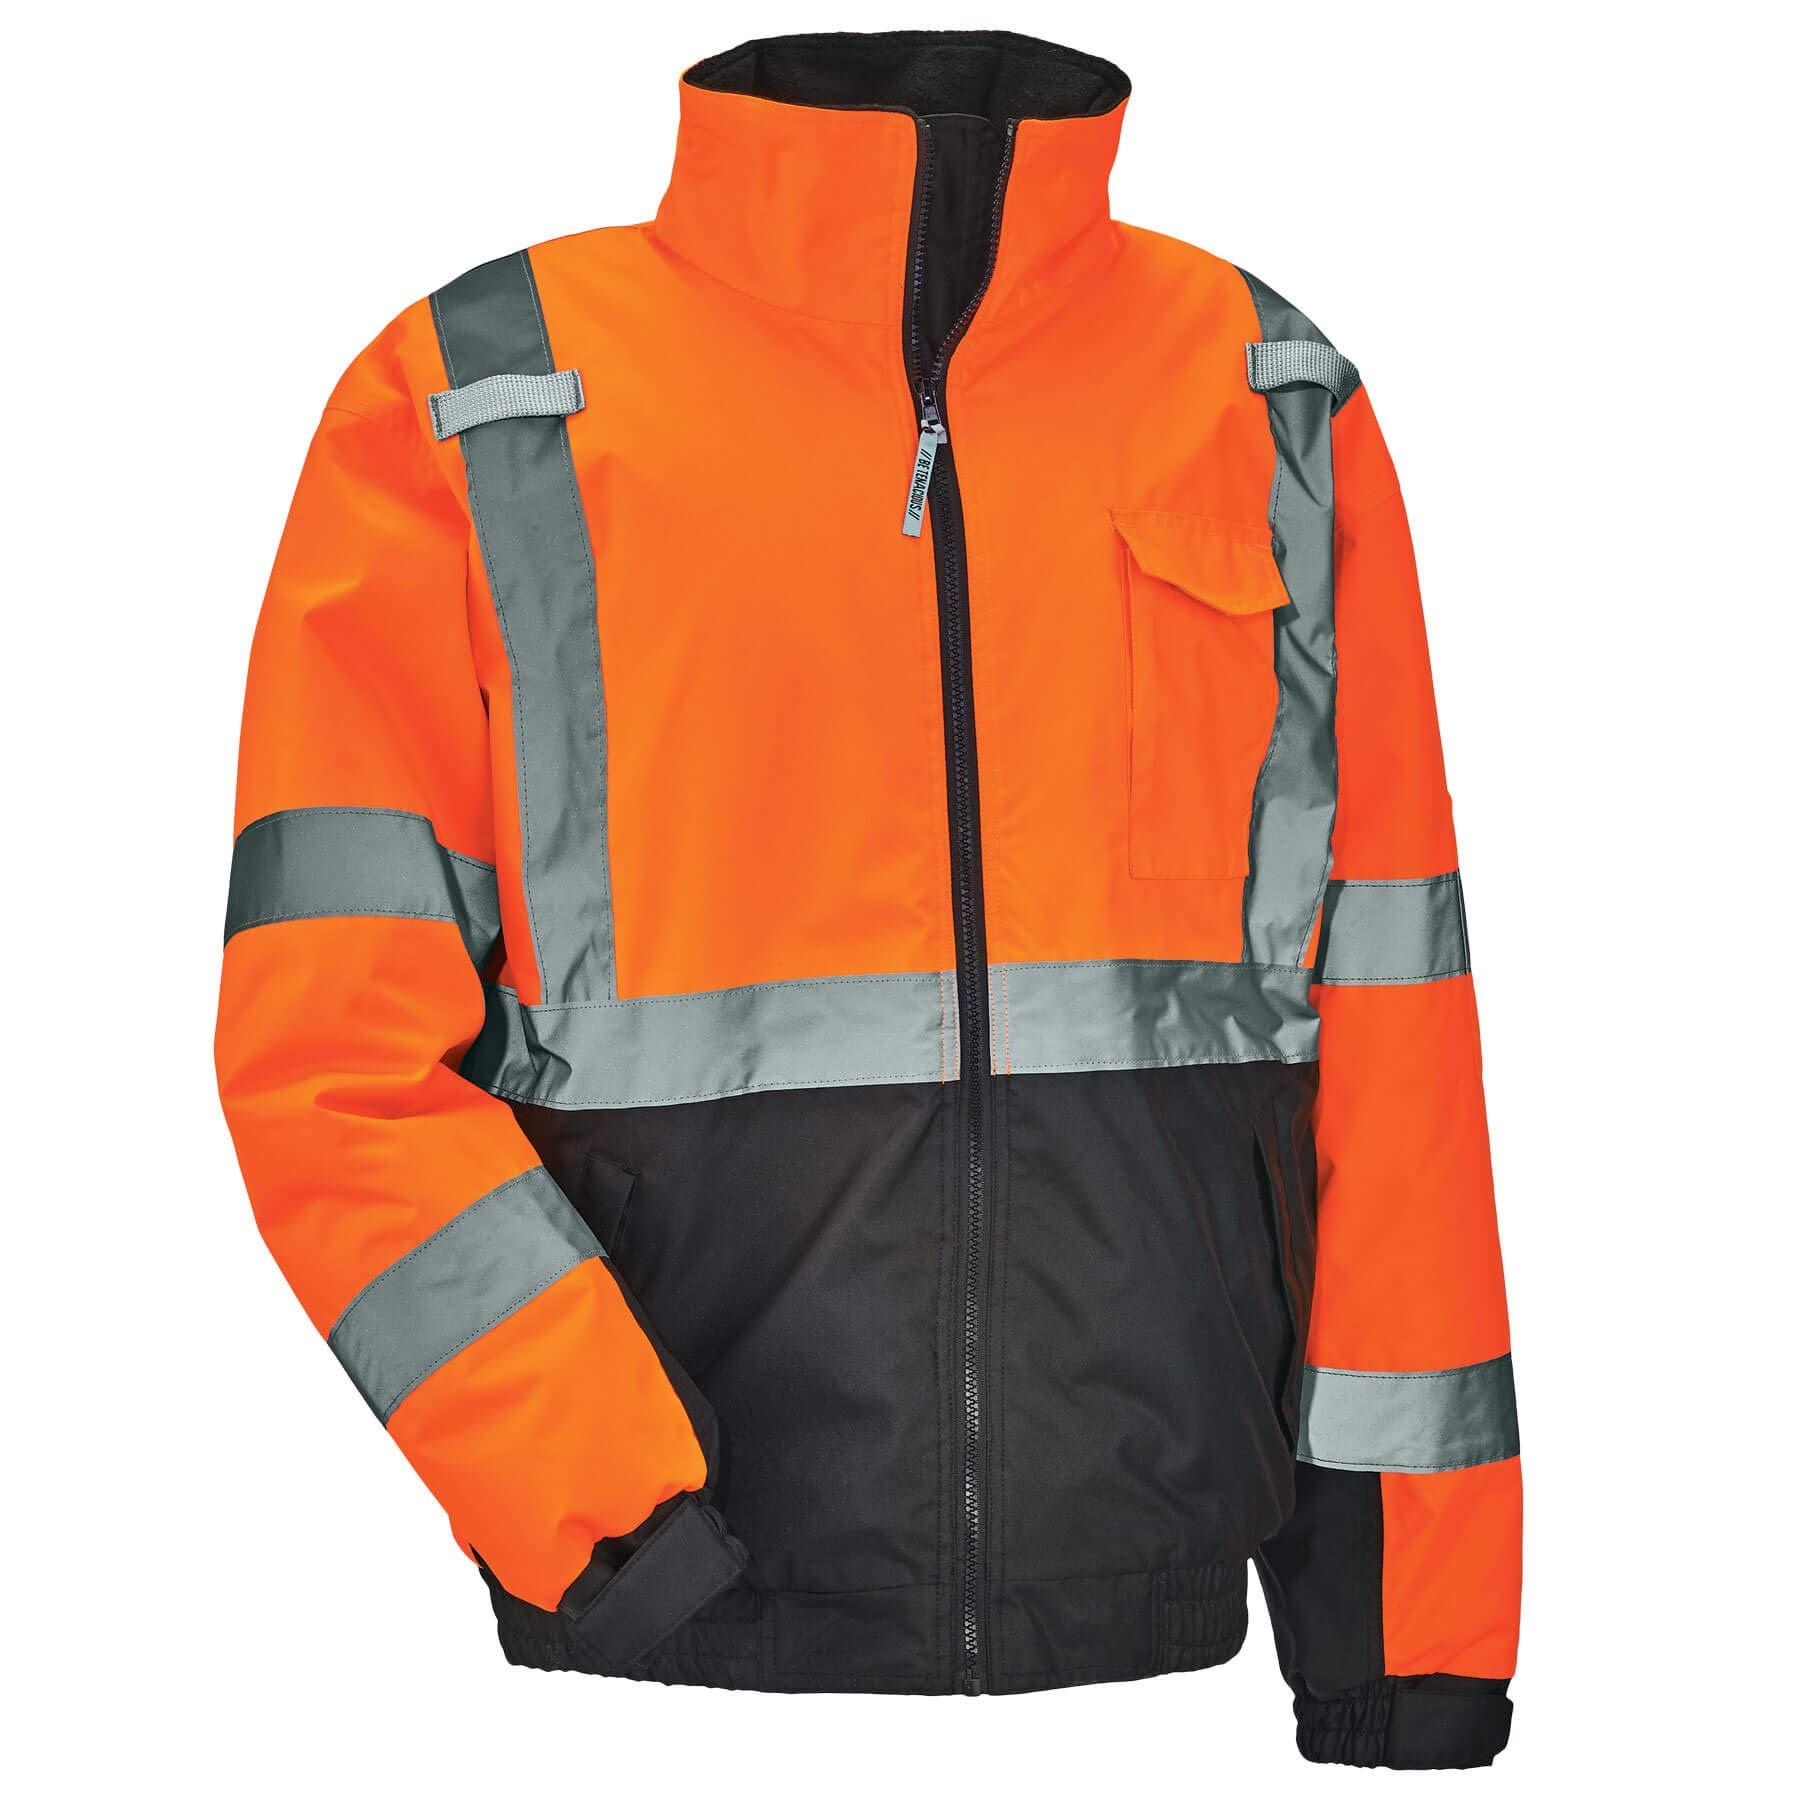 Ergodyne GloWear 8377 Black Bottom Thermal Bomber Jacket, Large, Orange